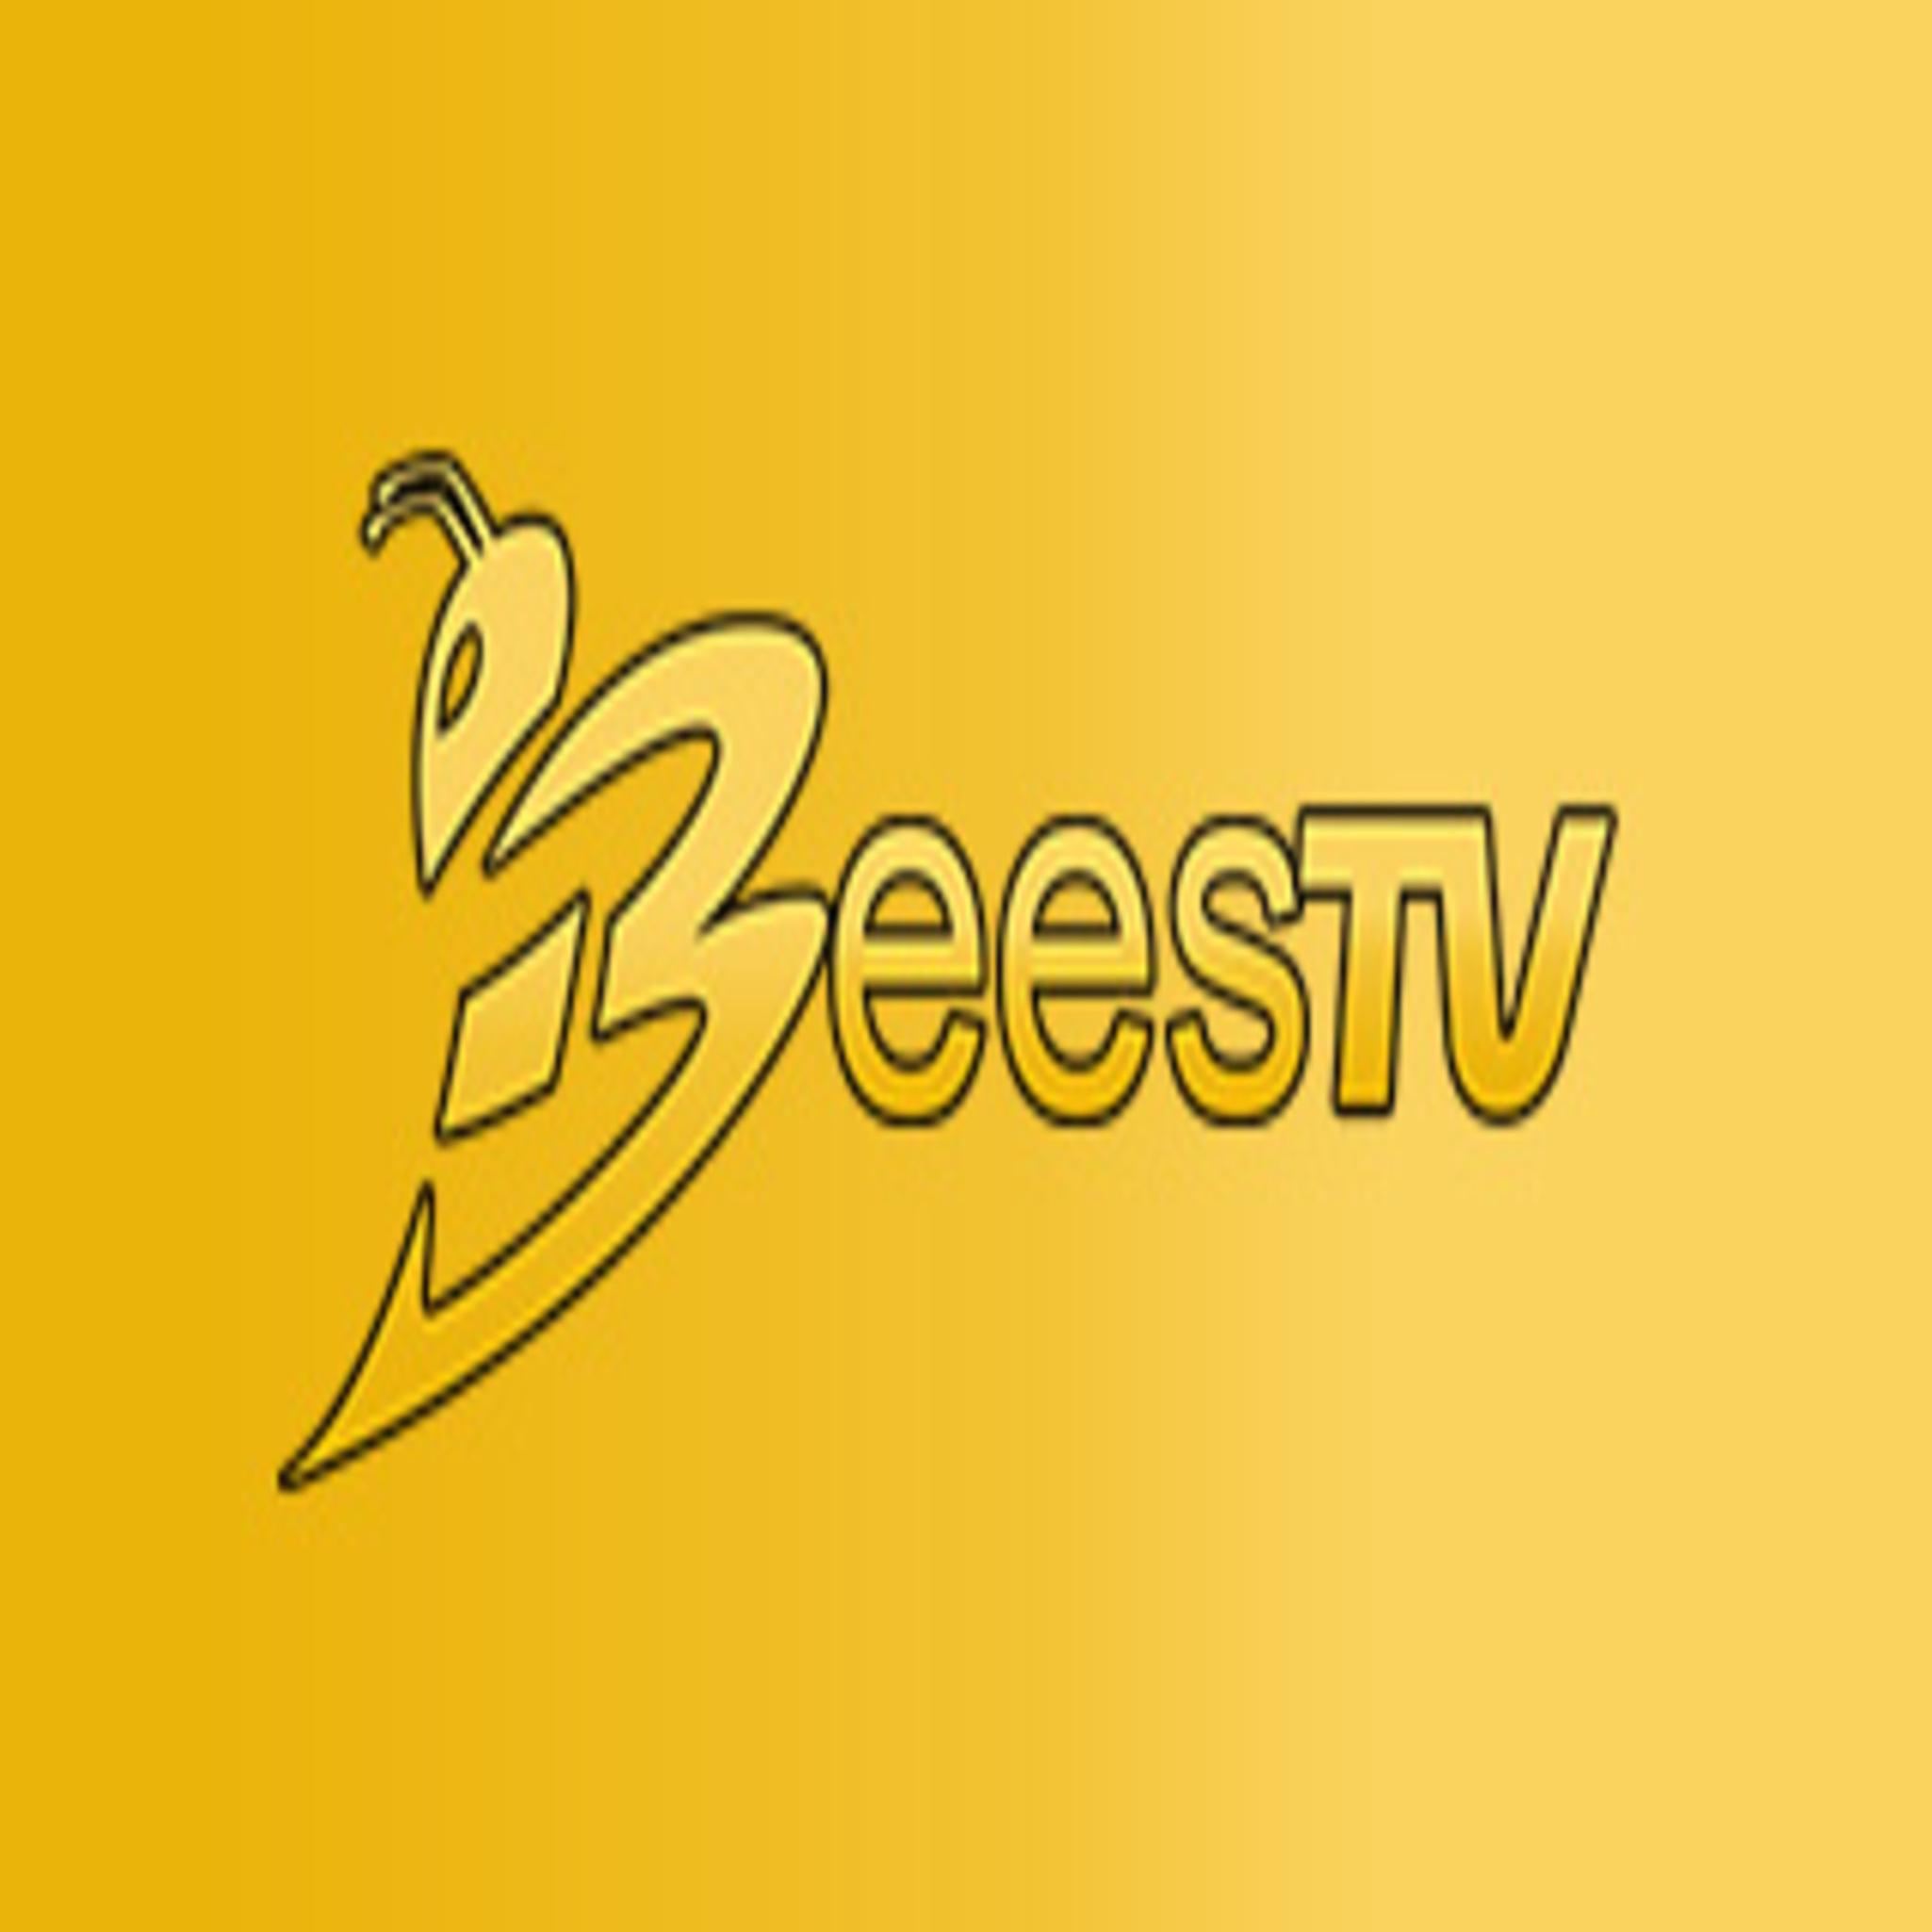 Teste Bees tv - P2P IPTV